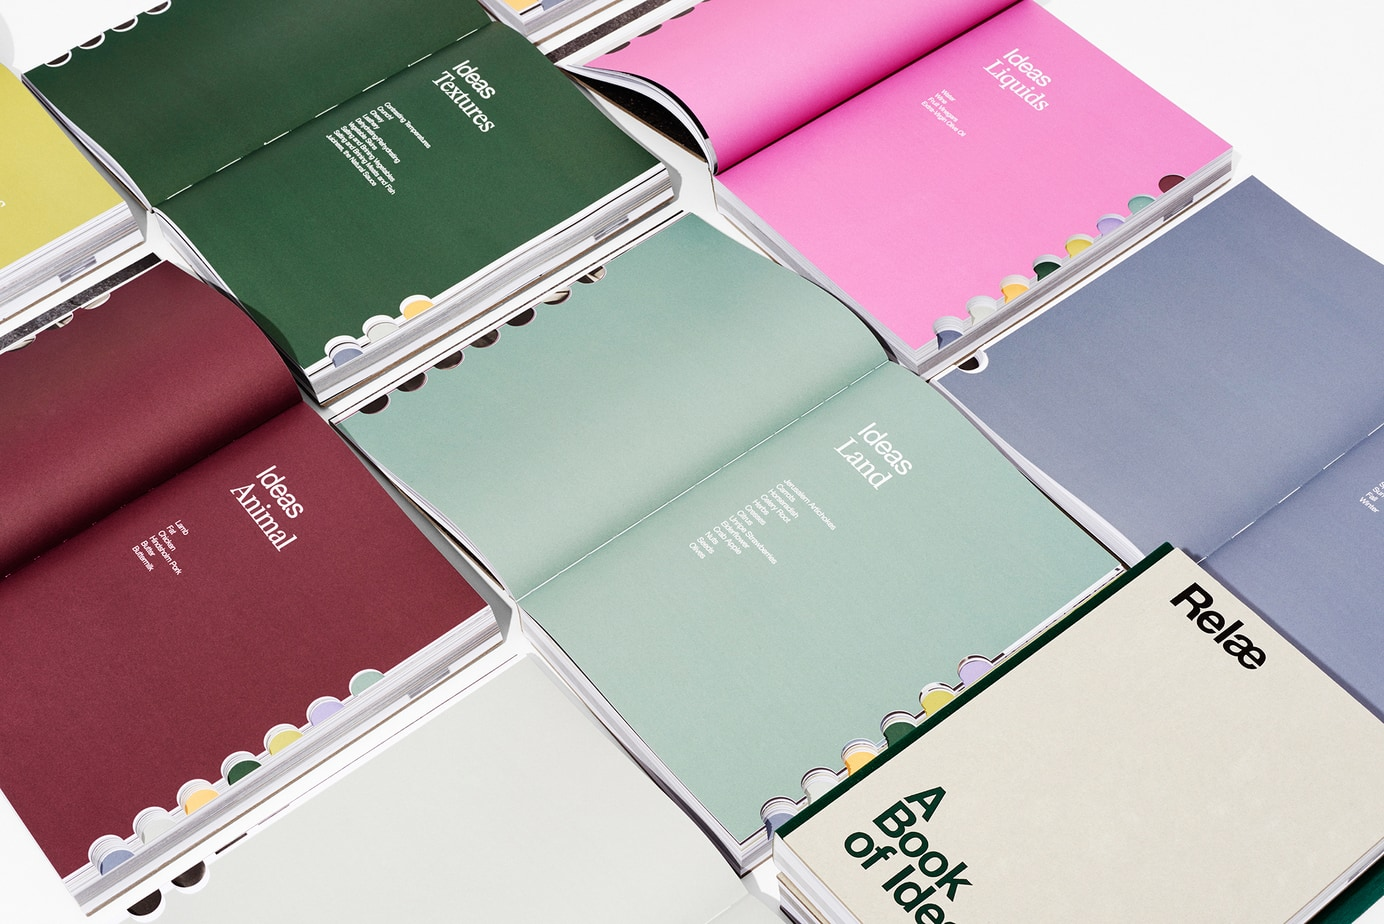 The Color Club - 2015.01.09 HOMEWORK PACKS3528 1